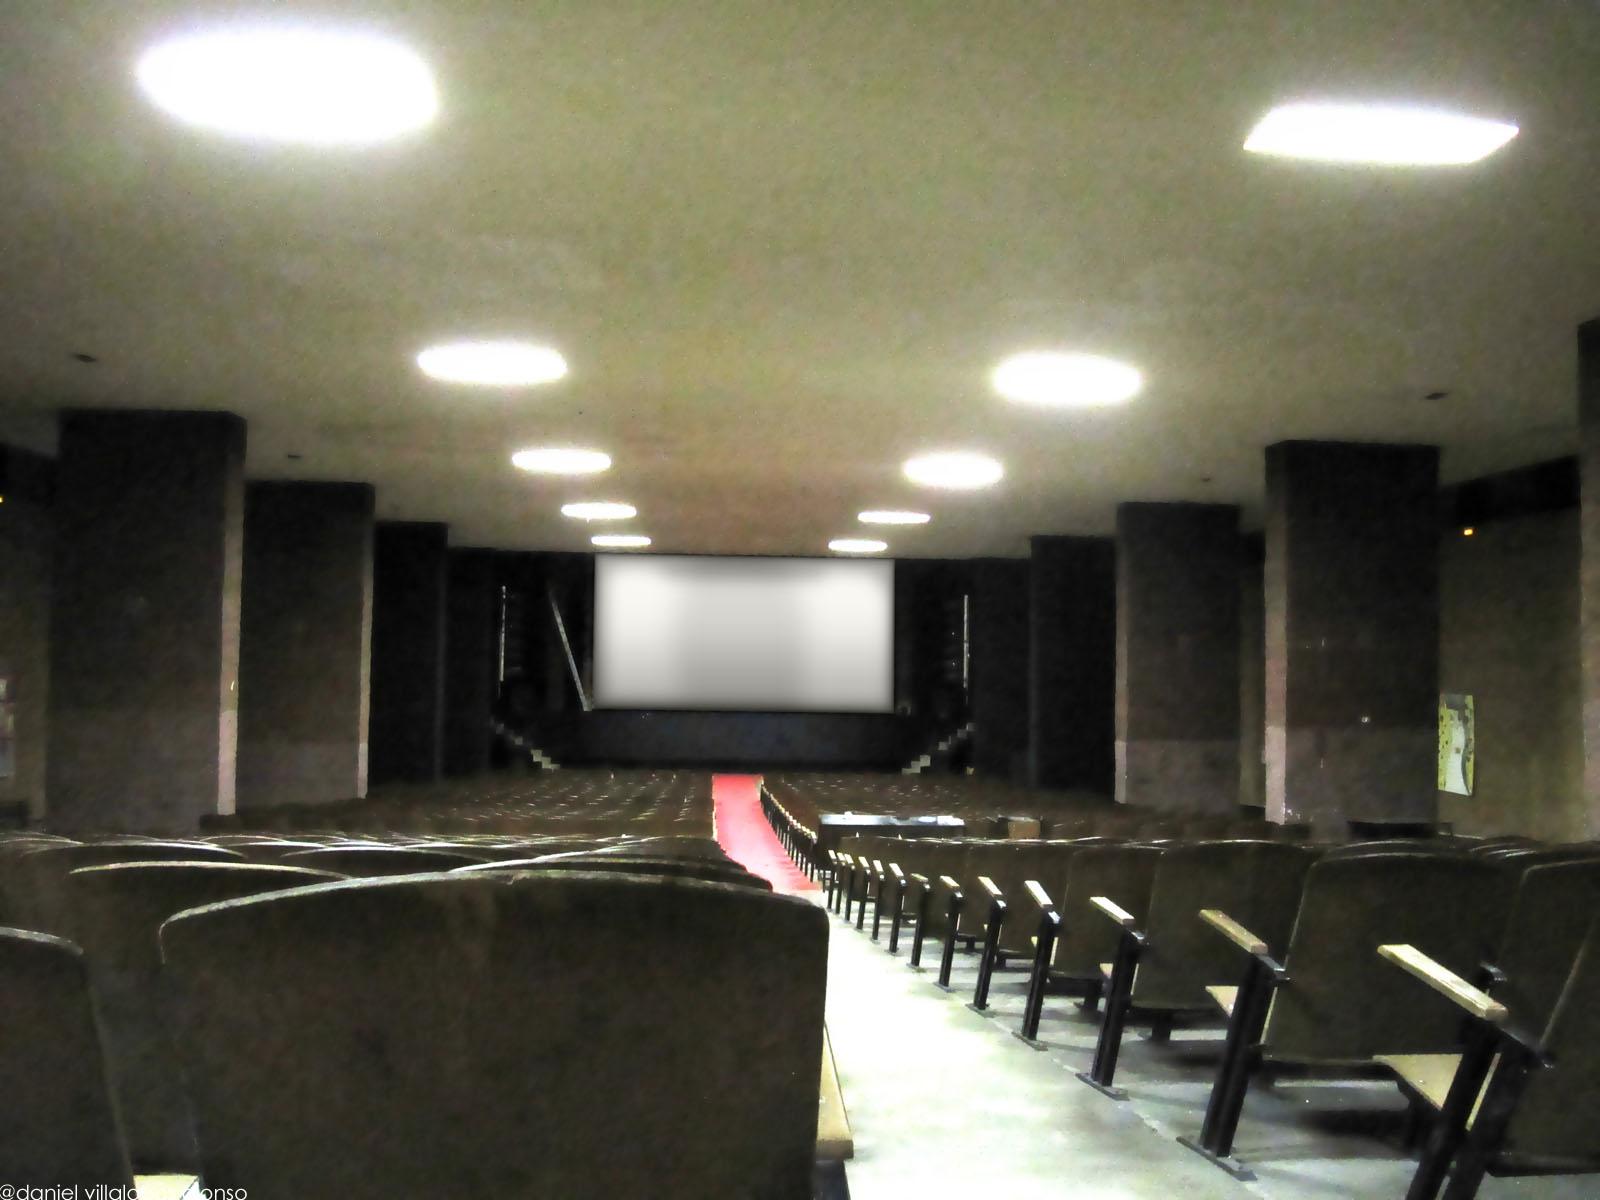 danielvillalobos-cines-digitalphotographies-modernarchitecture-71